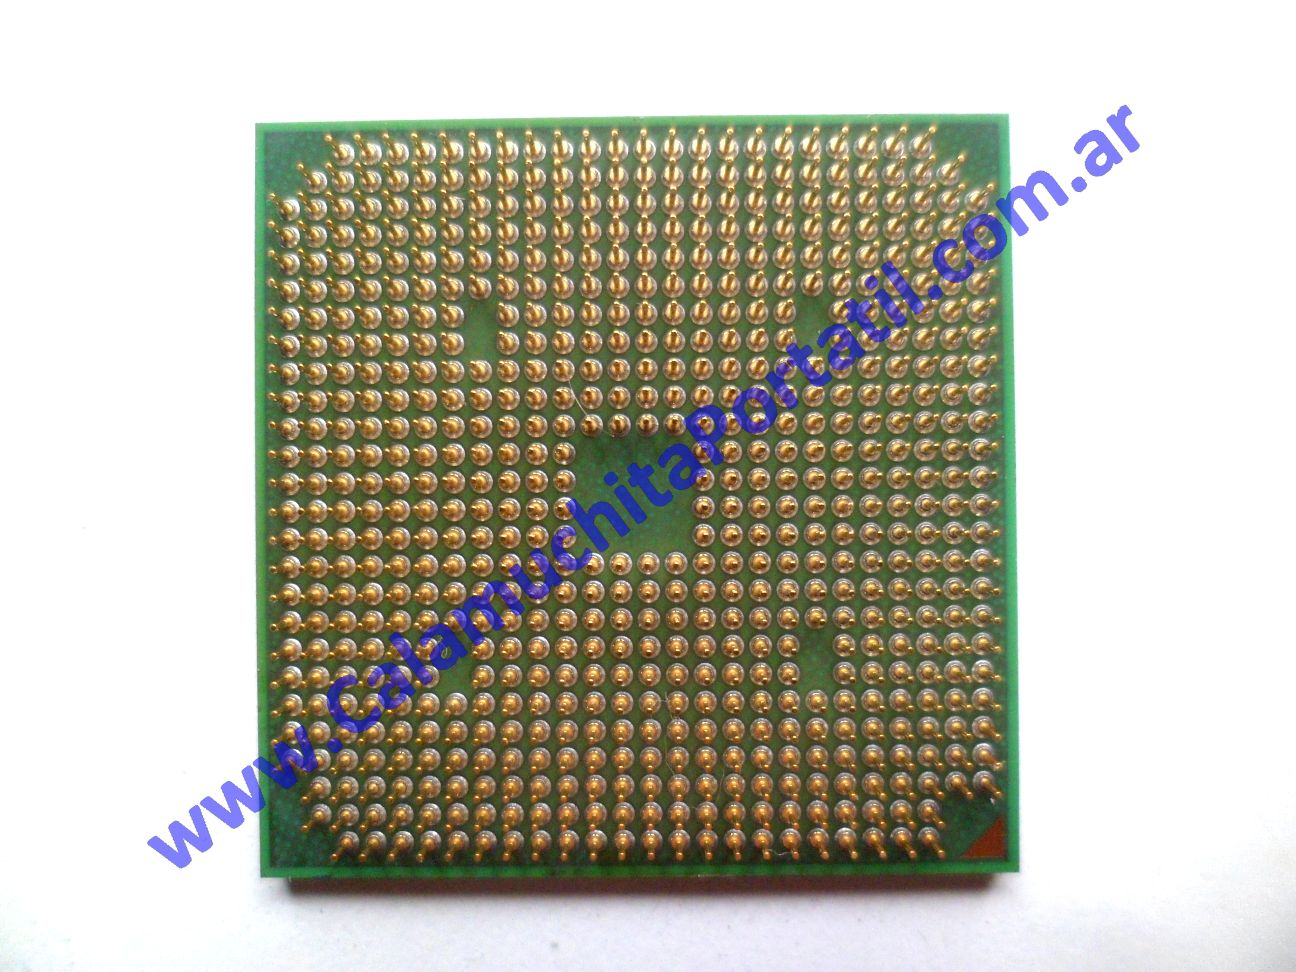 0536QQA Procesador Hewlett Packard Pavillion dv5-1004nr / FE765UA#ABA